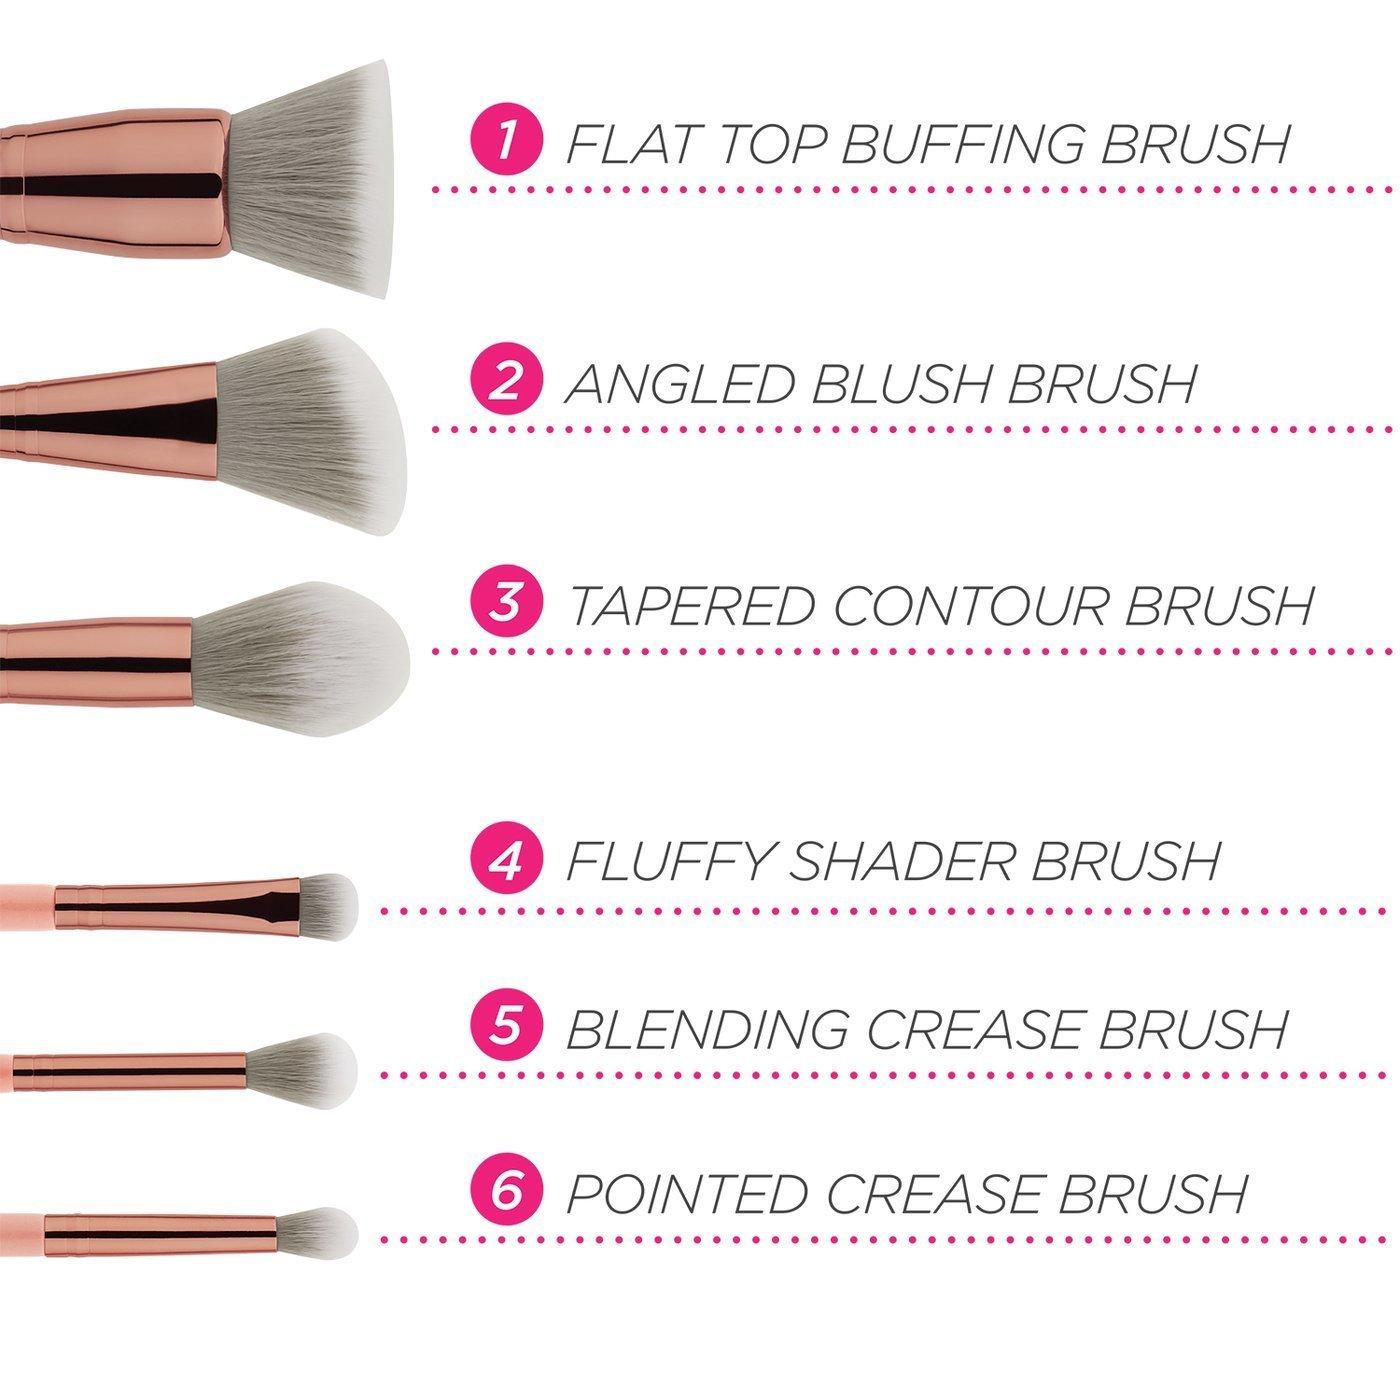 BH Cosmetics Petite Chic 6 piece brush set